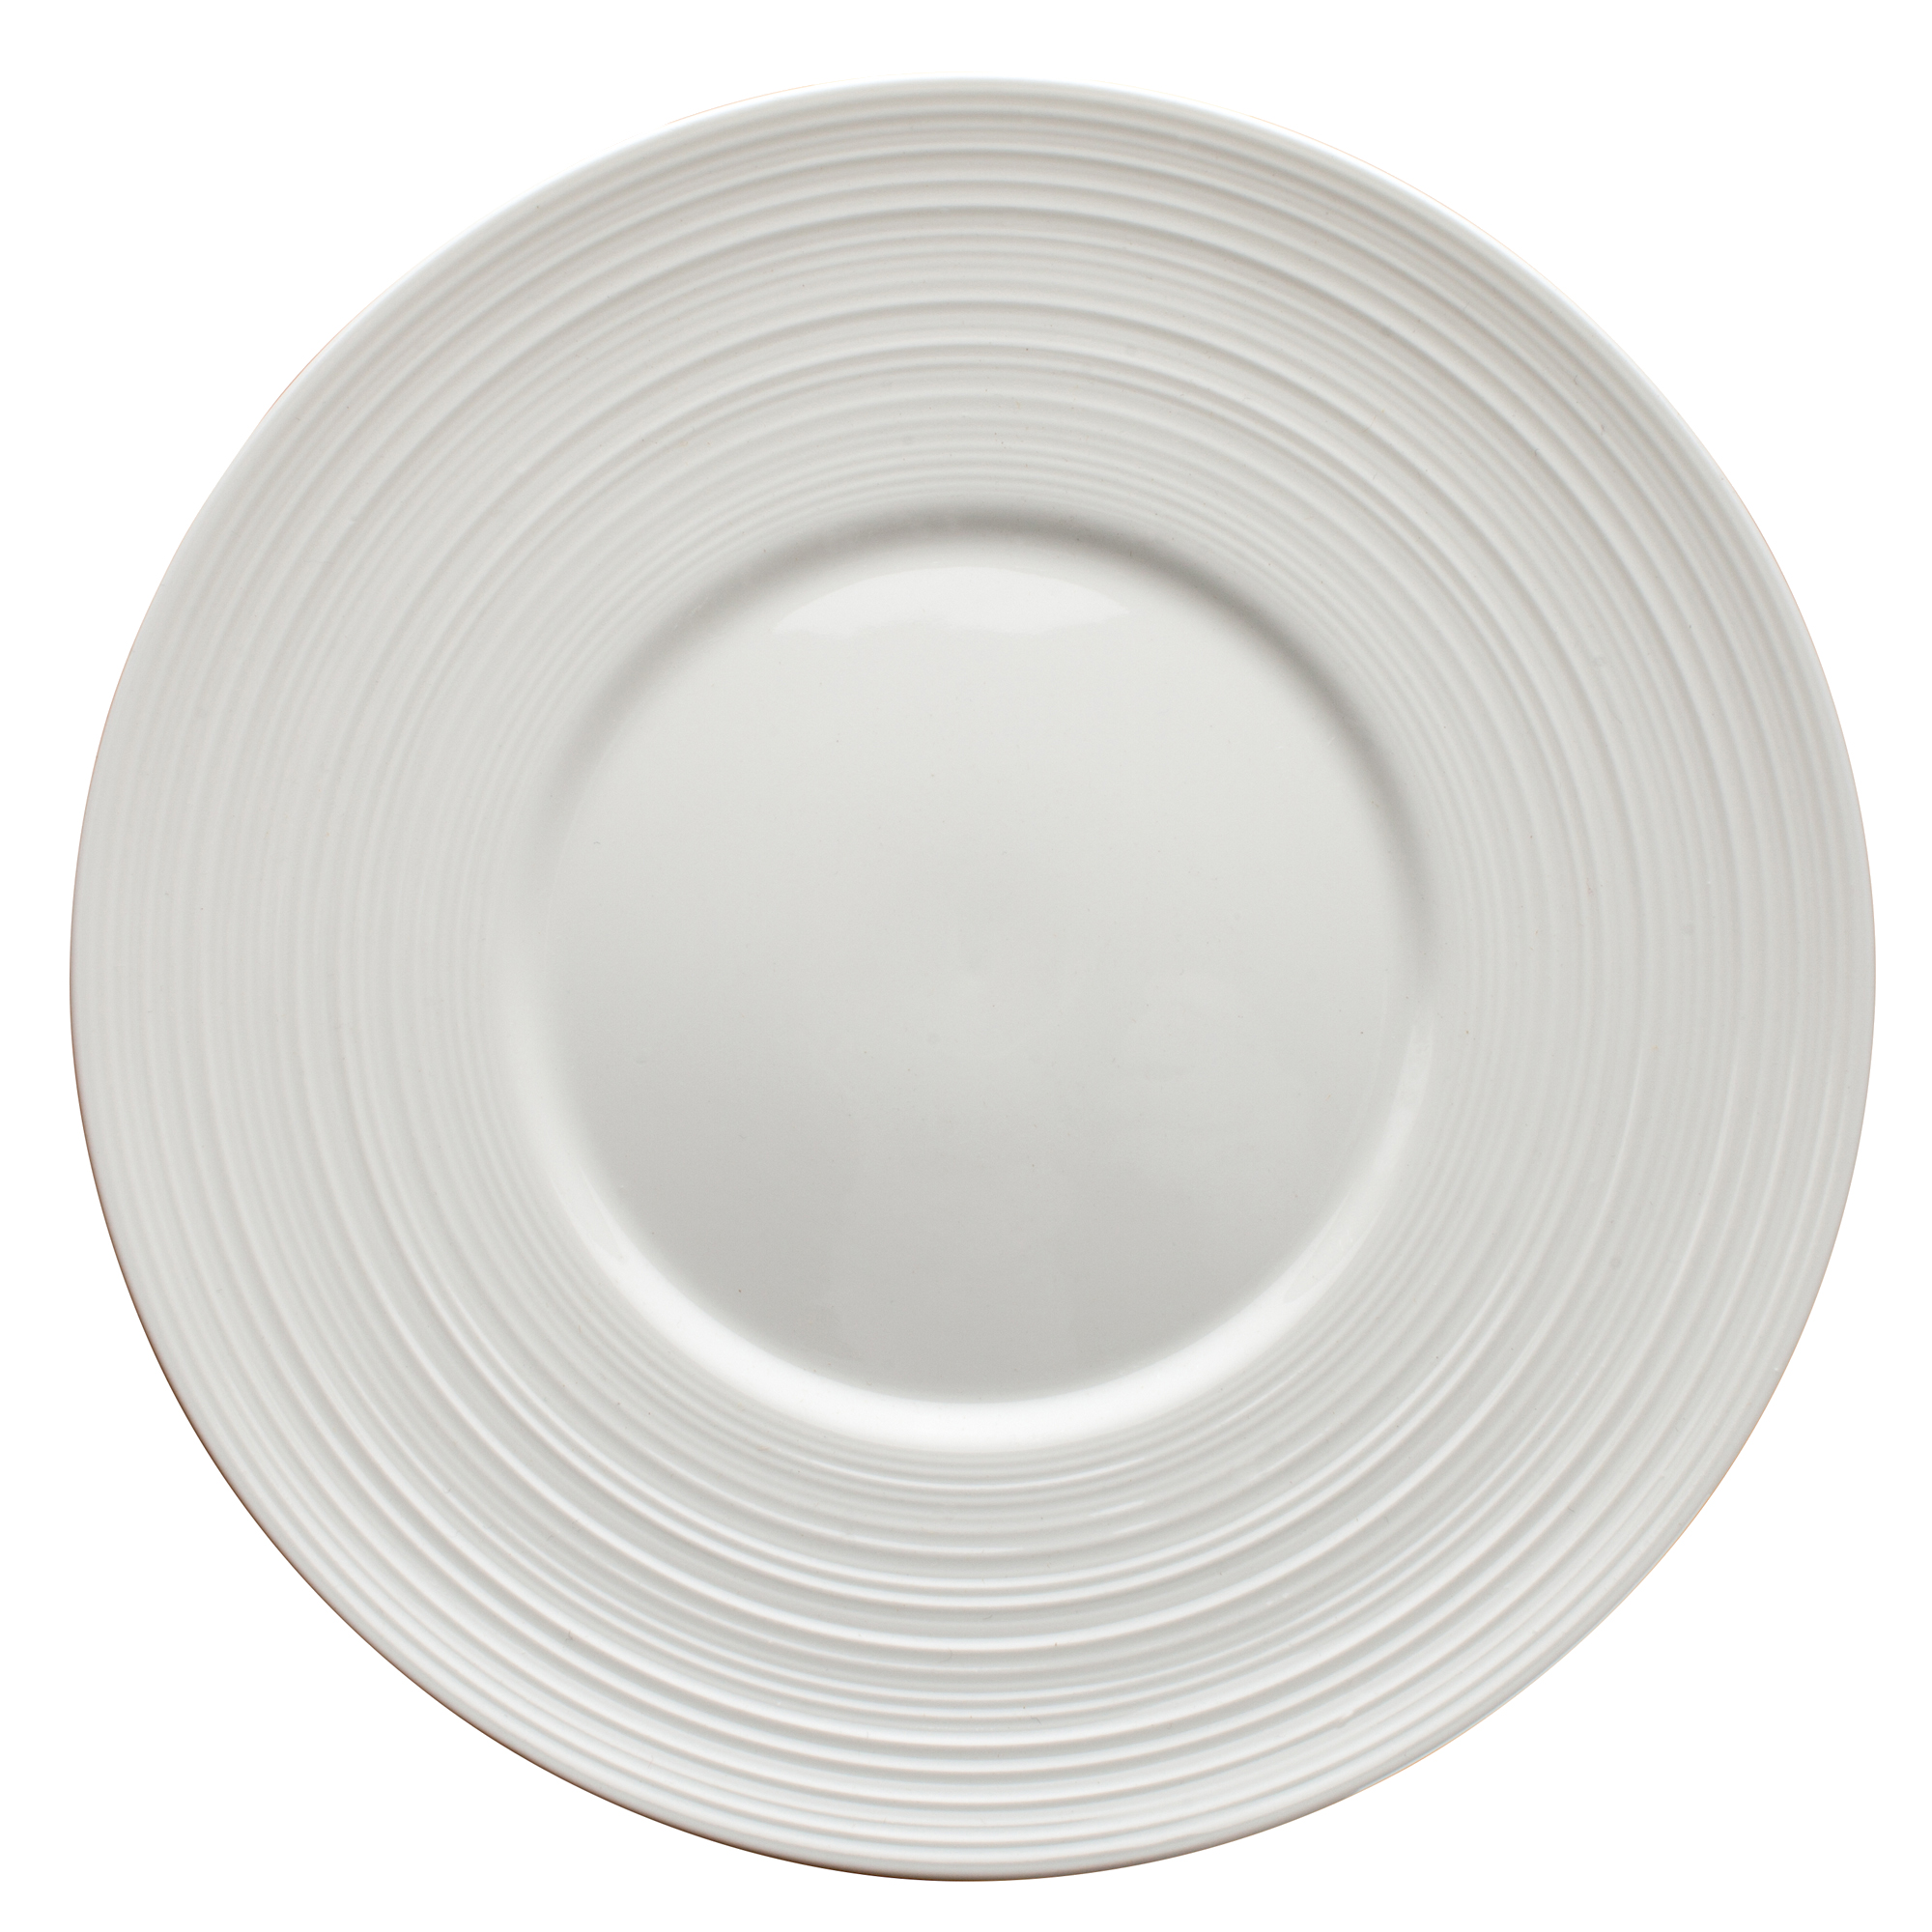 Winco WDP022-106 plate, china